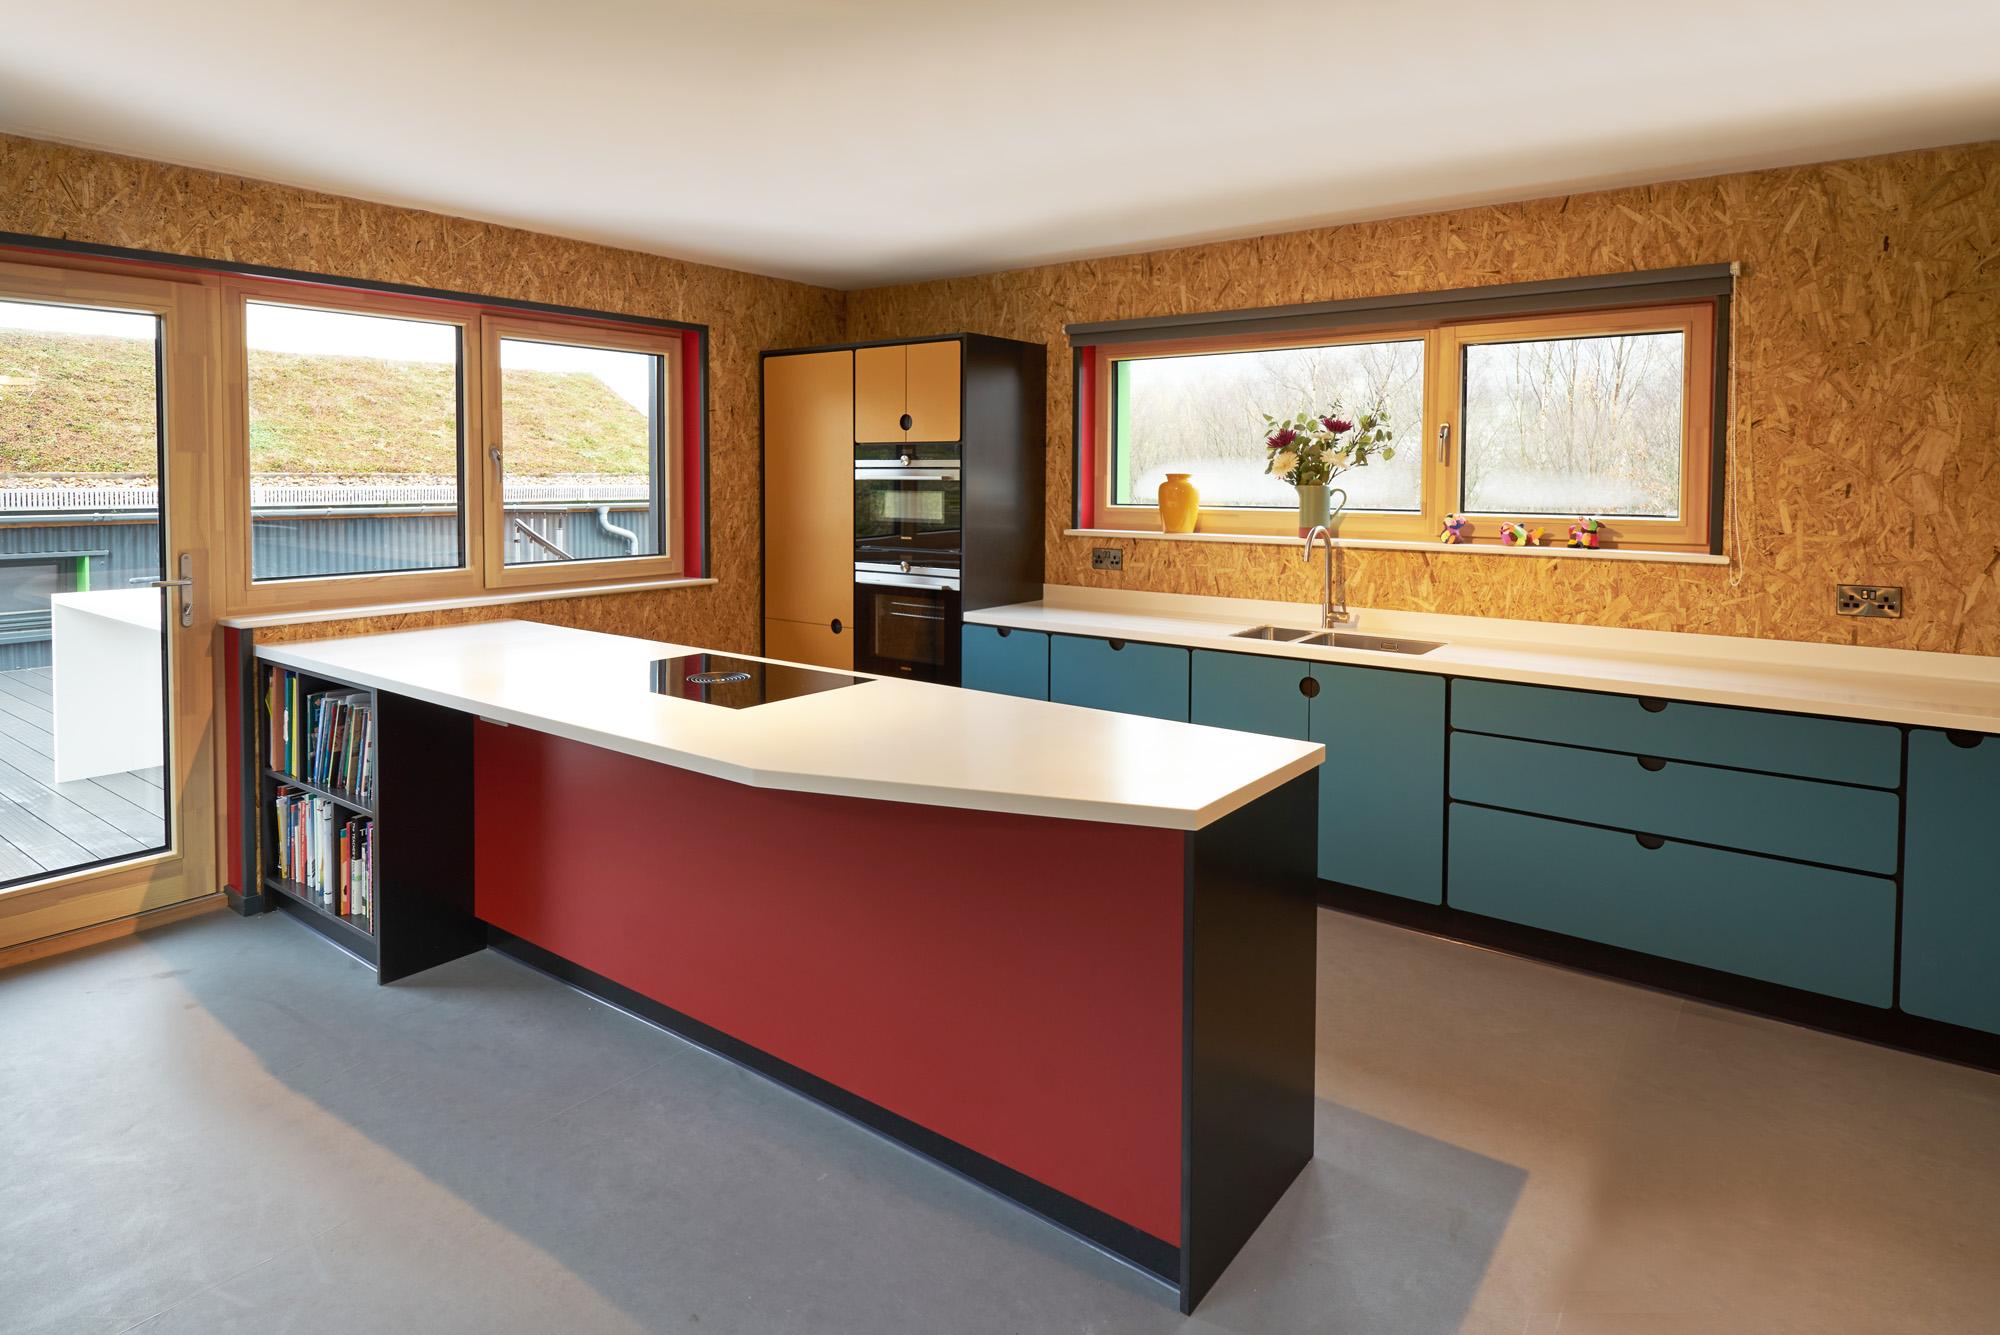 valchromat kitchen blue and red